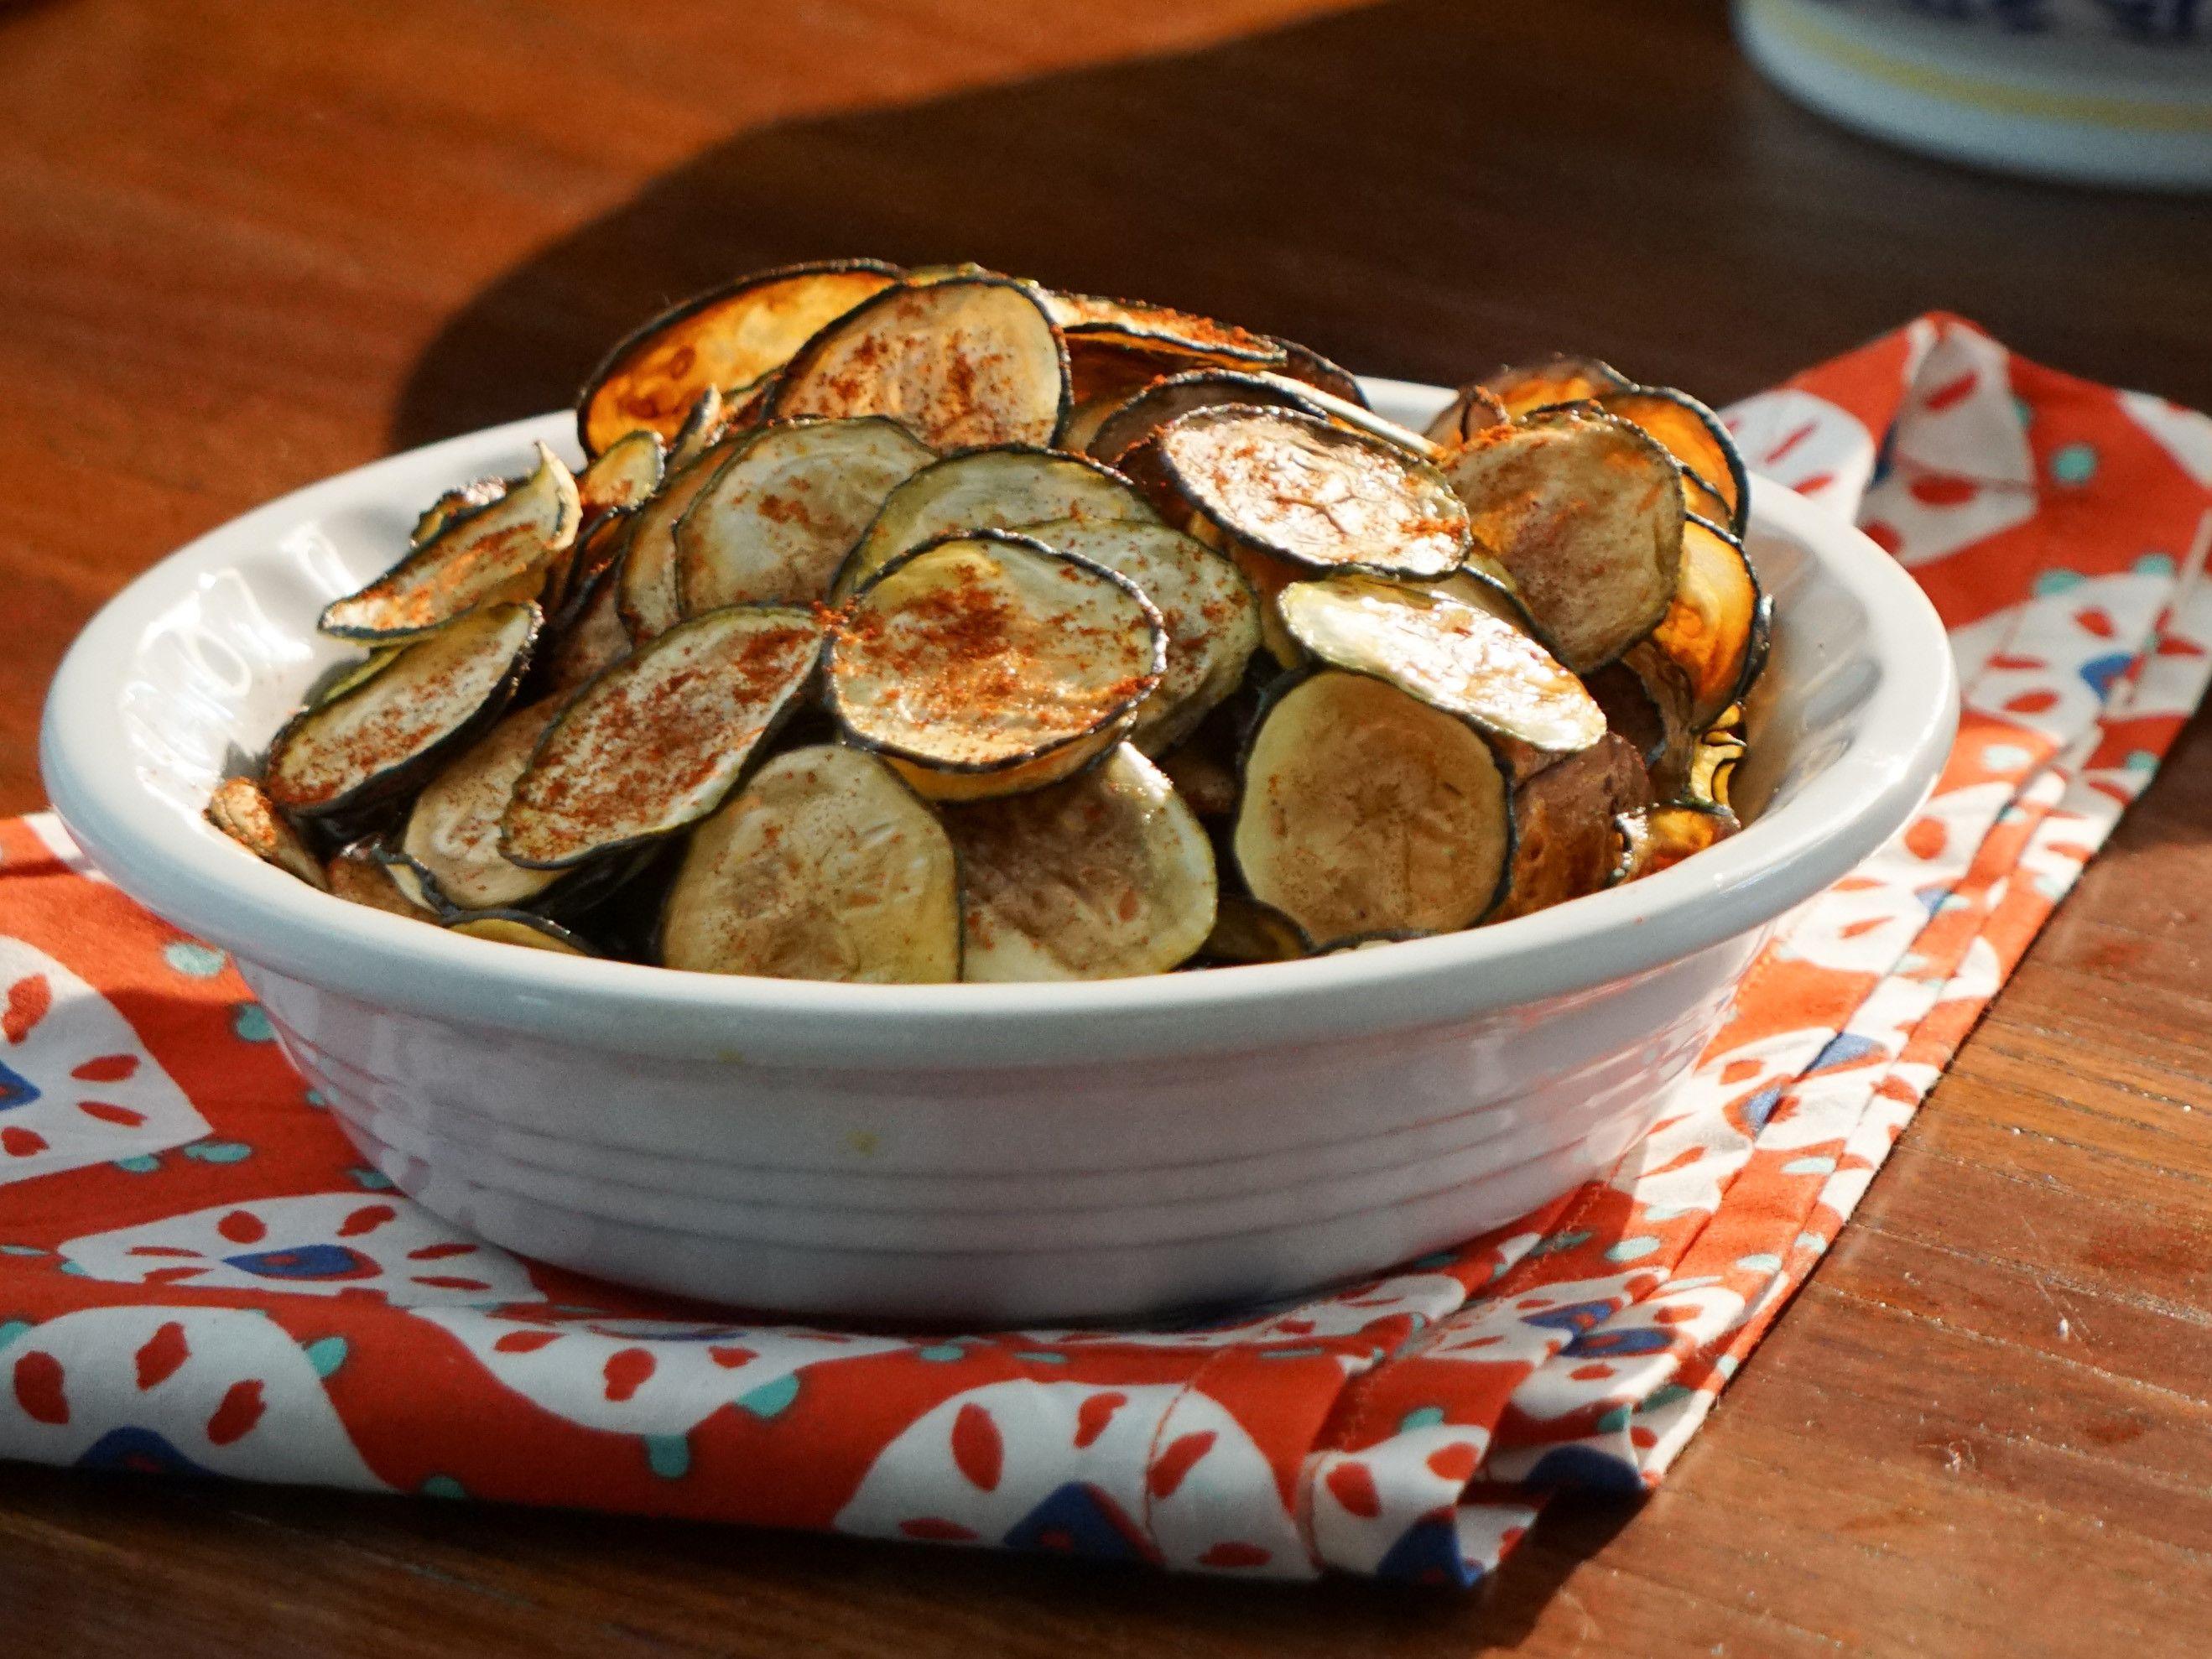 Banana Cherry Custard Muffins Recipe In 2020 Food Network Recipes Food Muffin Recipes